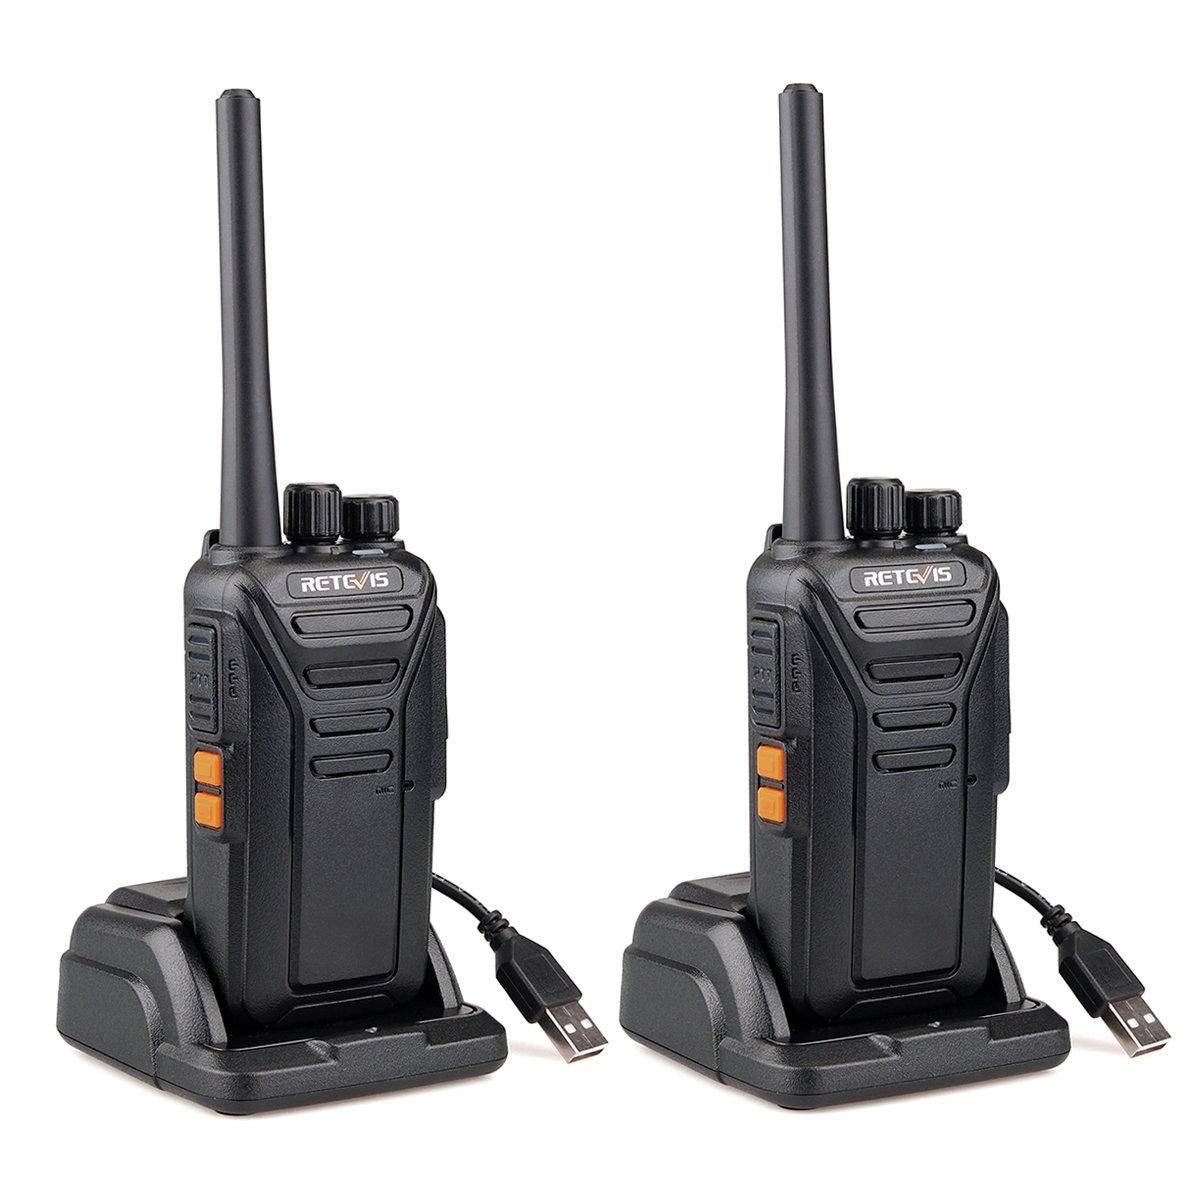 Retevis RT27 Walkie Talkie PMR446 Profesional Recargable 0.5W sin Licencia 16 Canal Subtono 50CTCSS 210DCS Vox Escanear Tot con Cargador(Negro,1 Par) EUA9133EX2